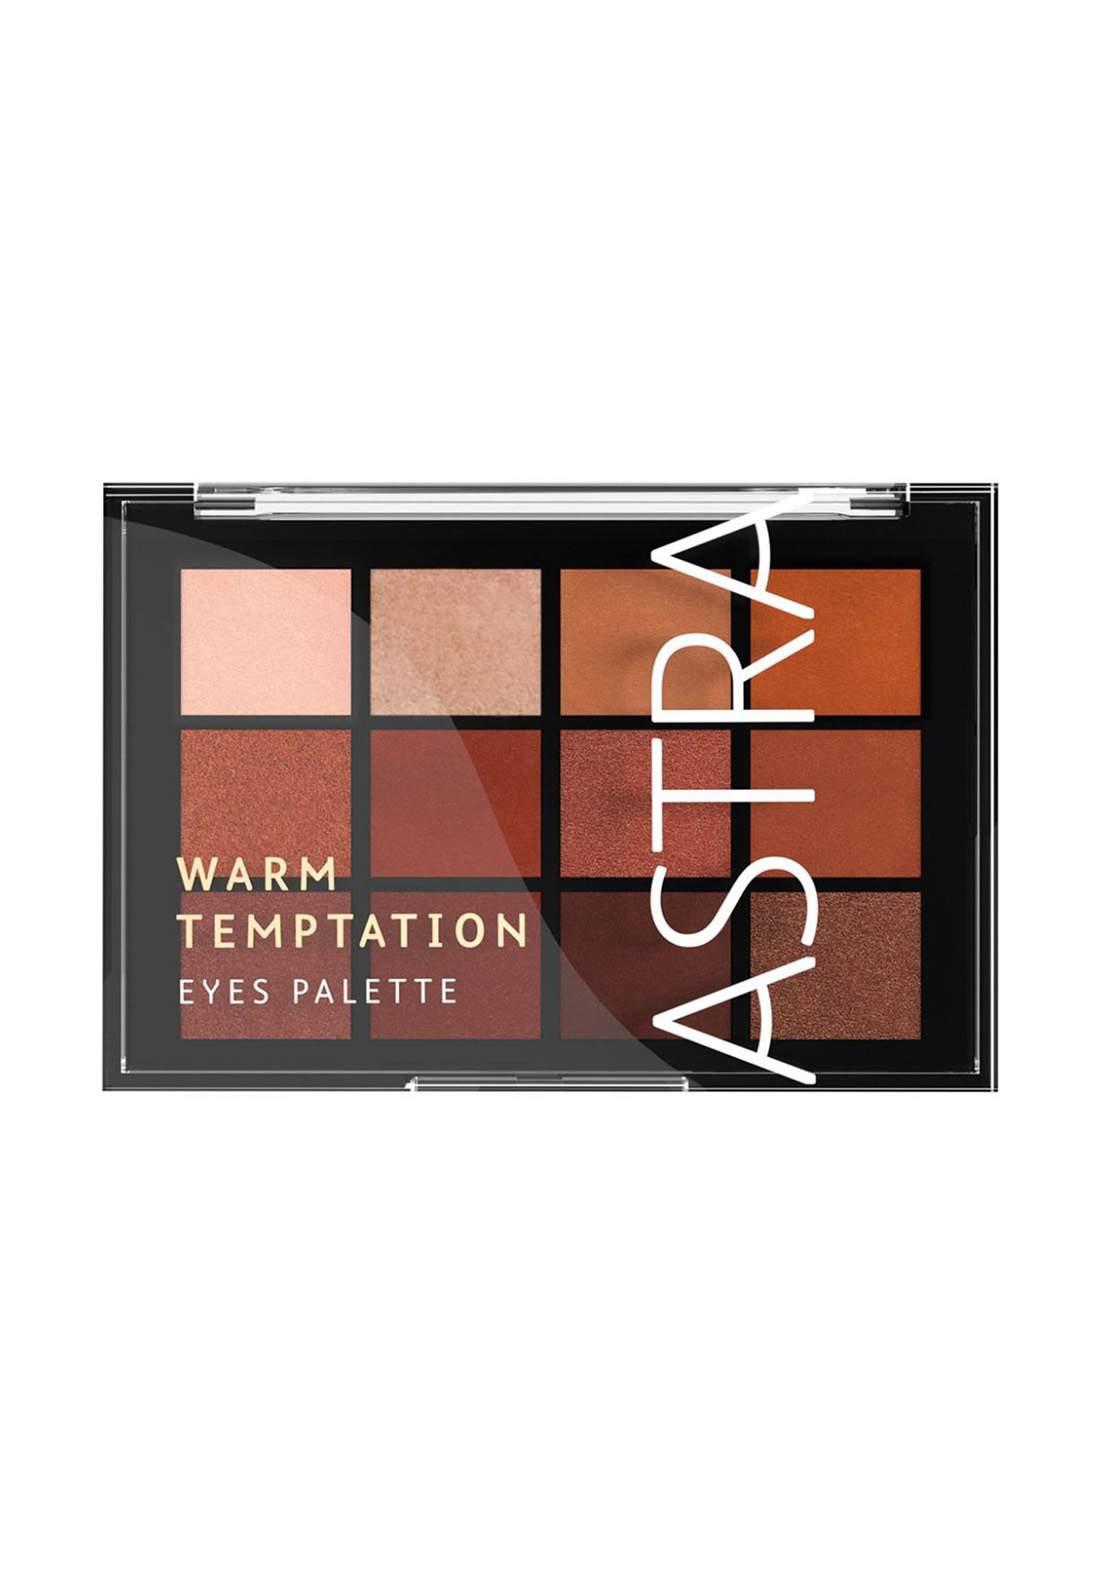 Astra Palette 0002 Warm Temptation Eyeshadow Palette  ظلال للعيون